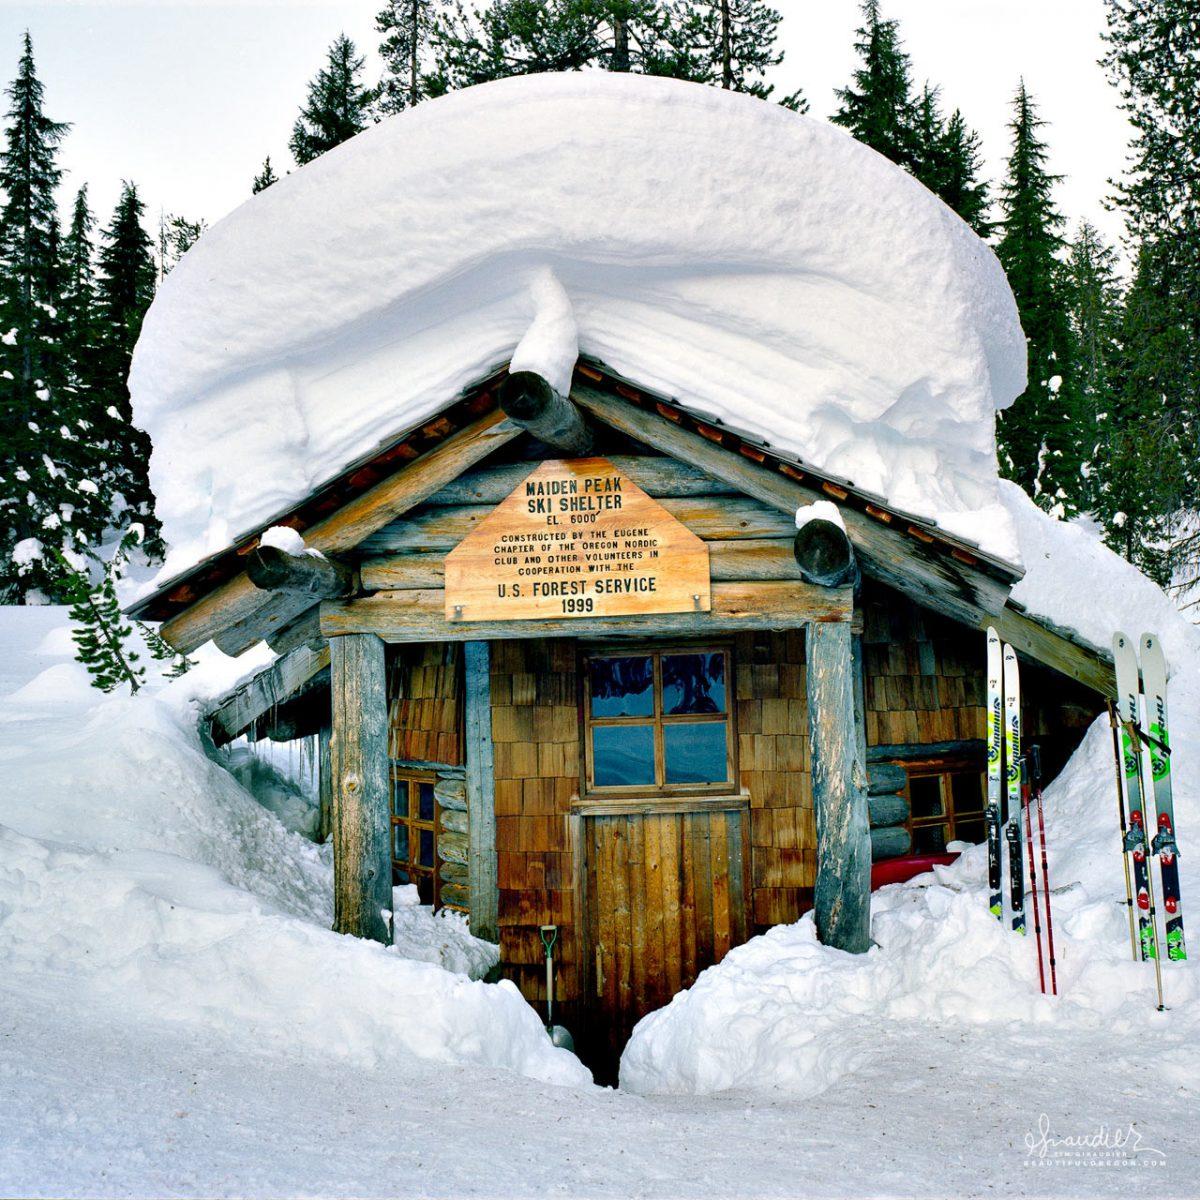 Maiden Peak Cabin Oregon backcounty ski shelter